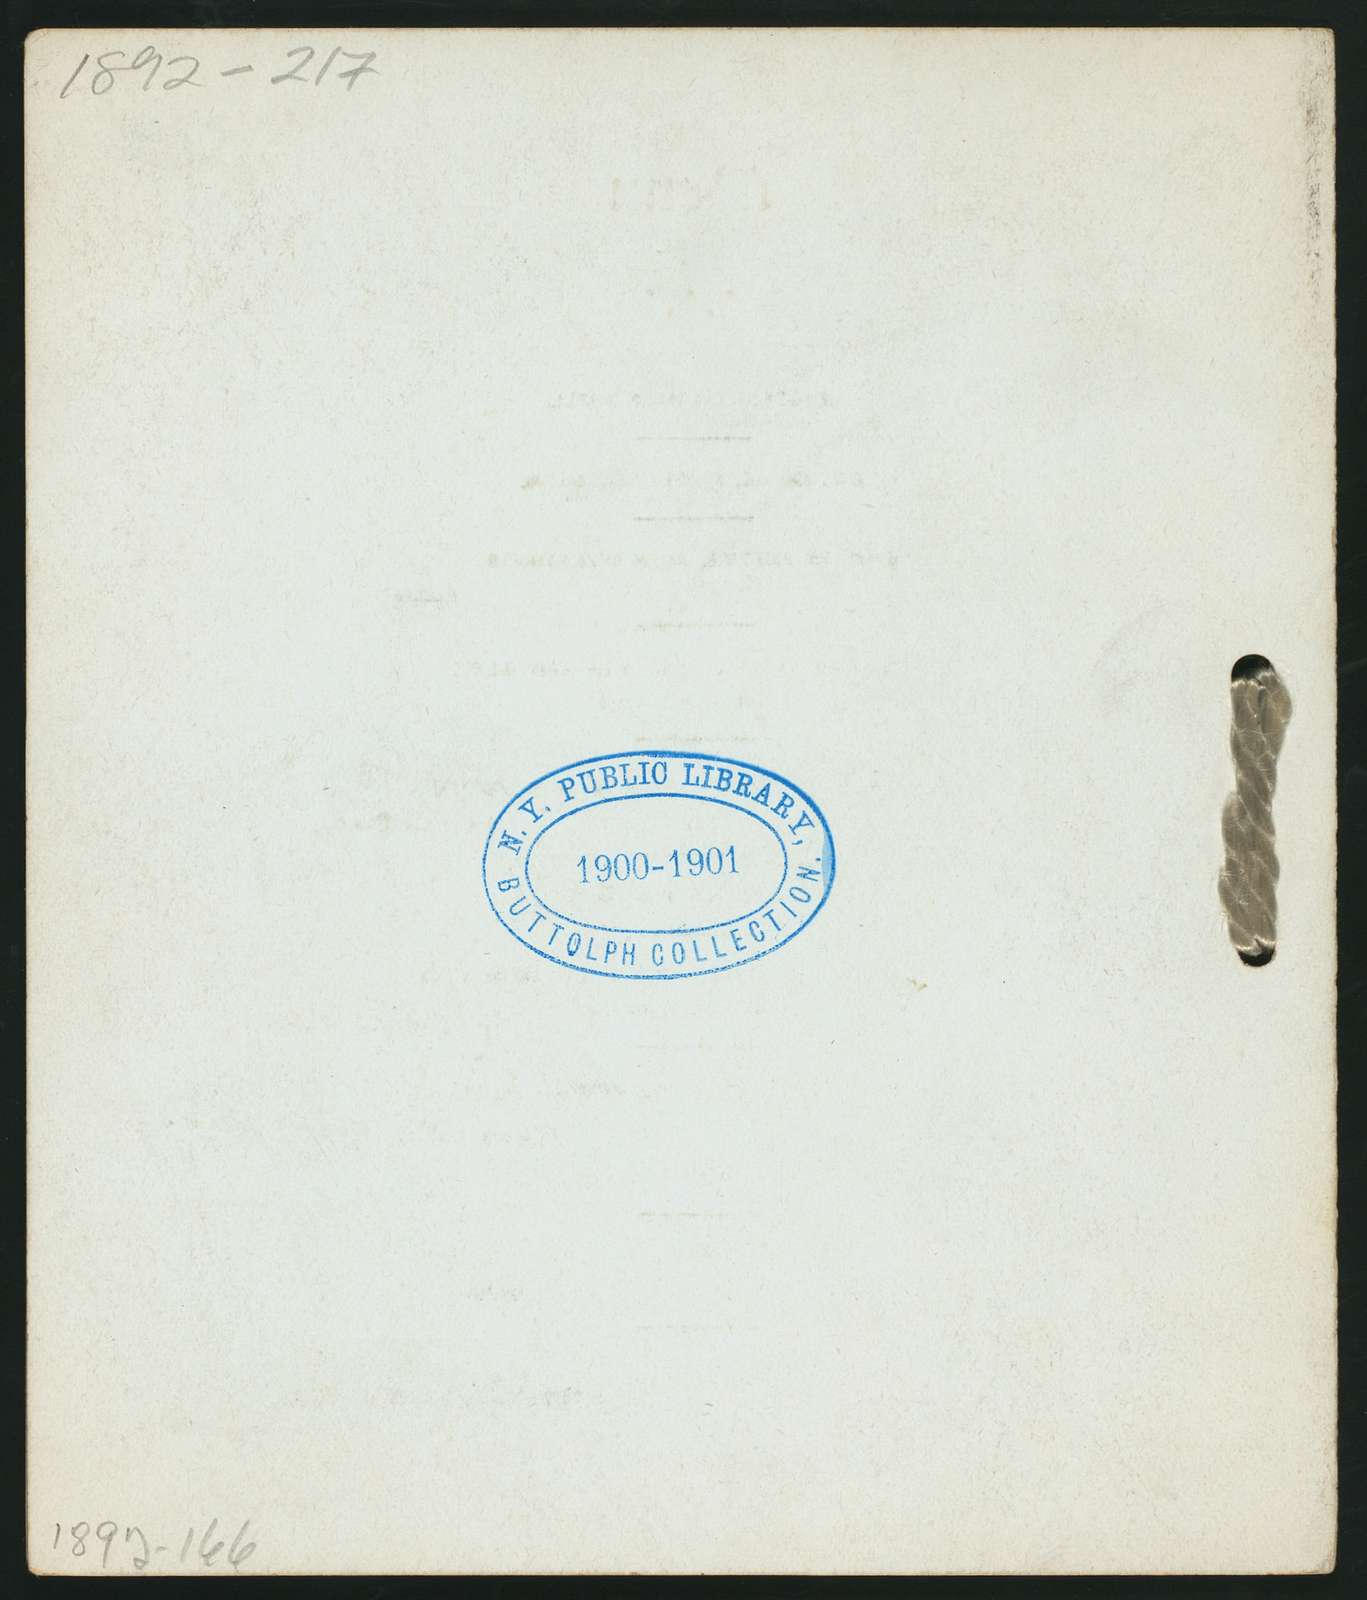 "BANQUET [held by] SENIOR CLASS COLUMBIAN UNIVERSITY LAW SCHOOL [at] ""THE COCHRAN, WASHINGTON, D.C."" (HOTEL;)"